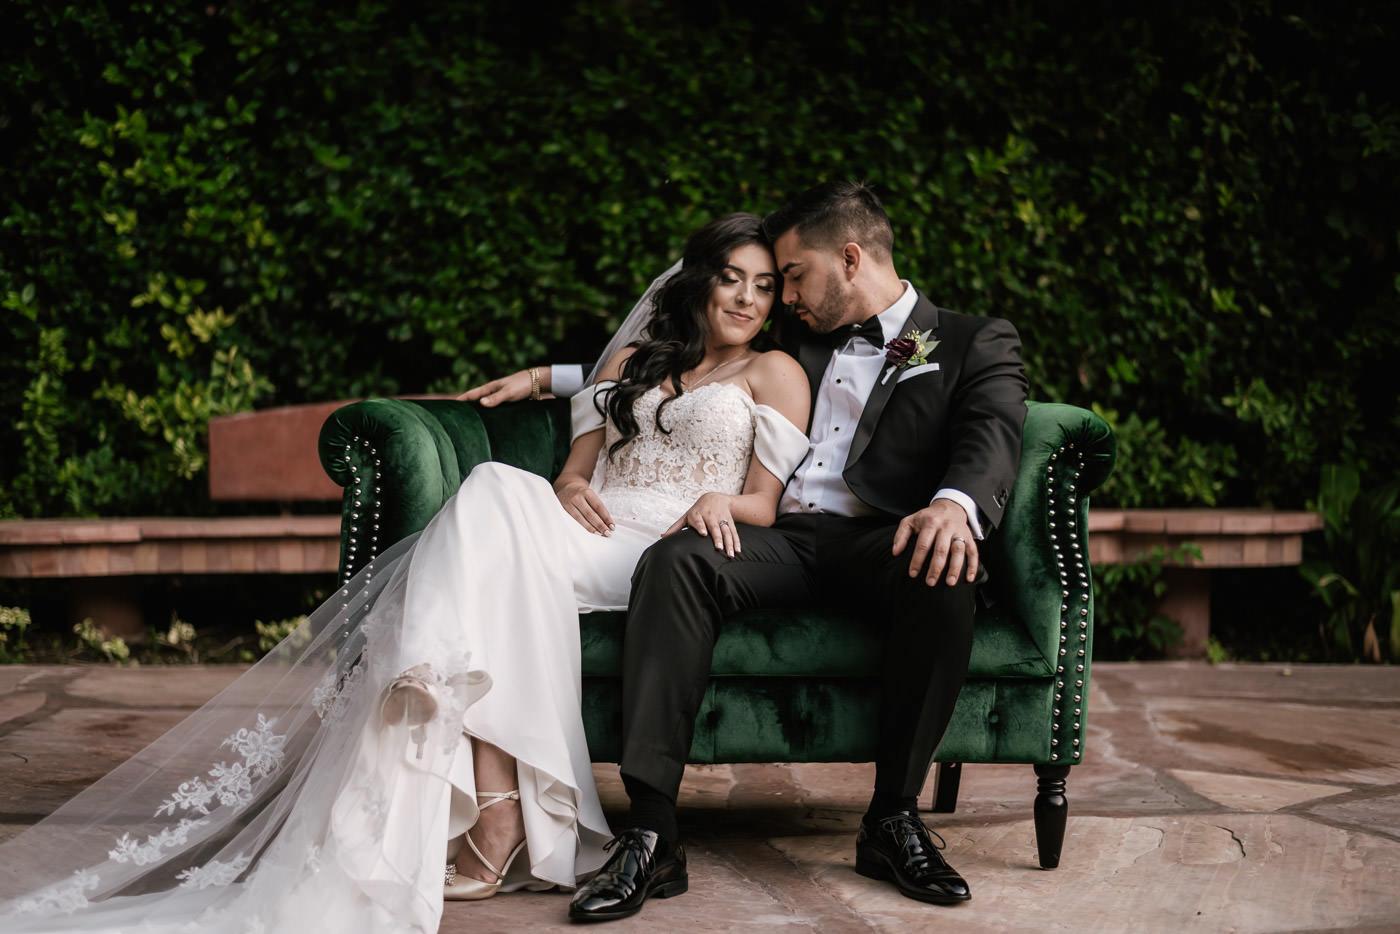 eden-gardens-wedding-photographer-romantic-68.jpg